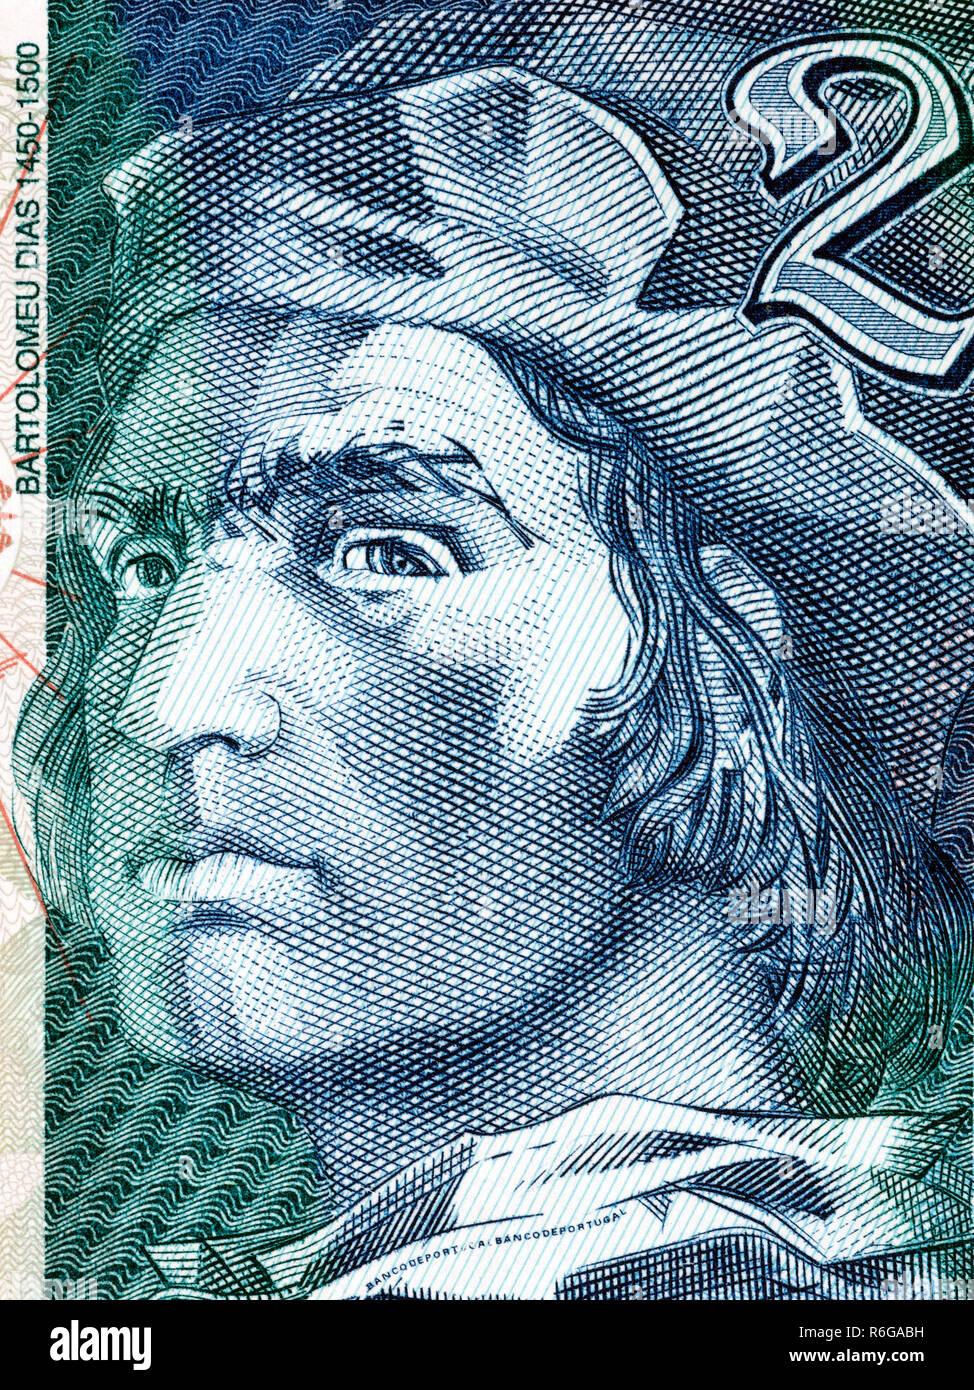 Bartolomeu Dias portrait - Stock Image